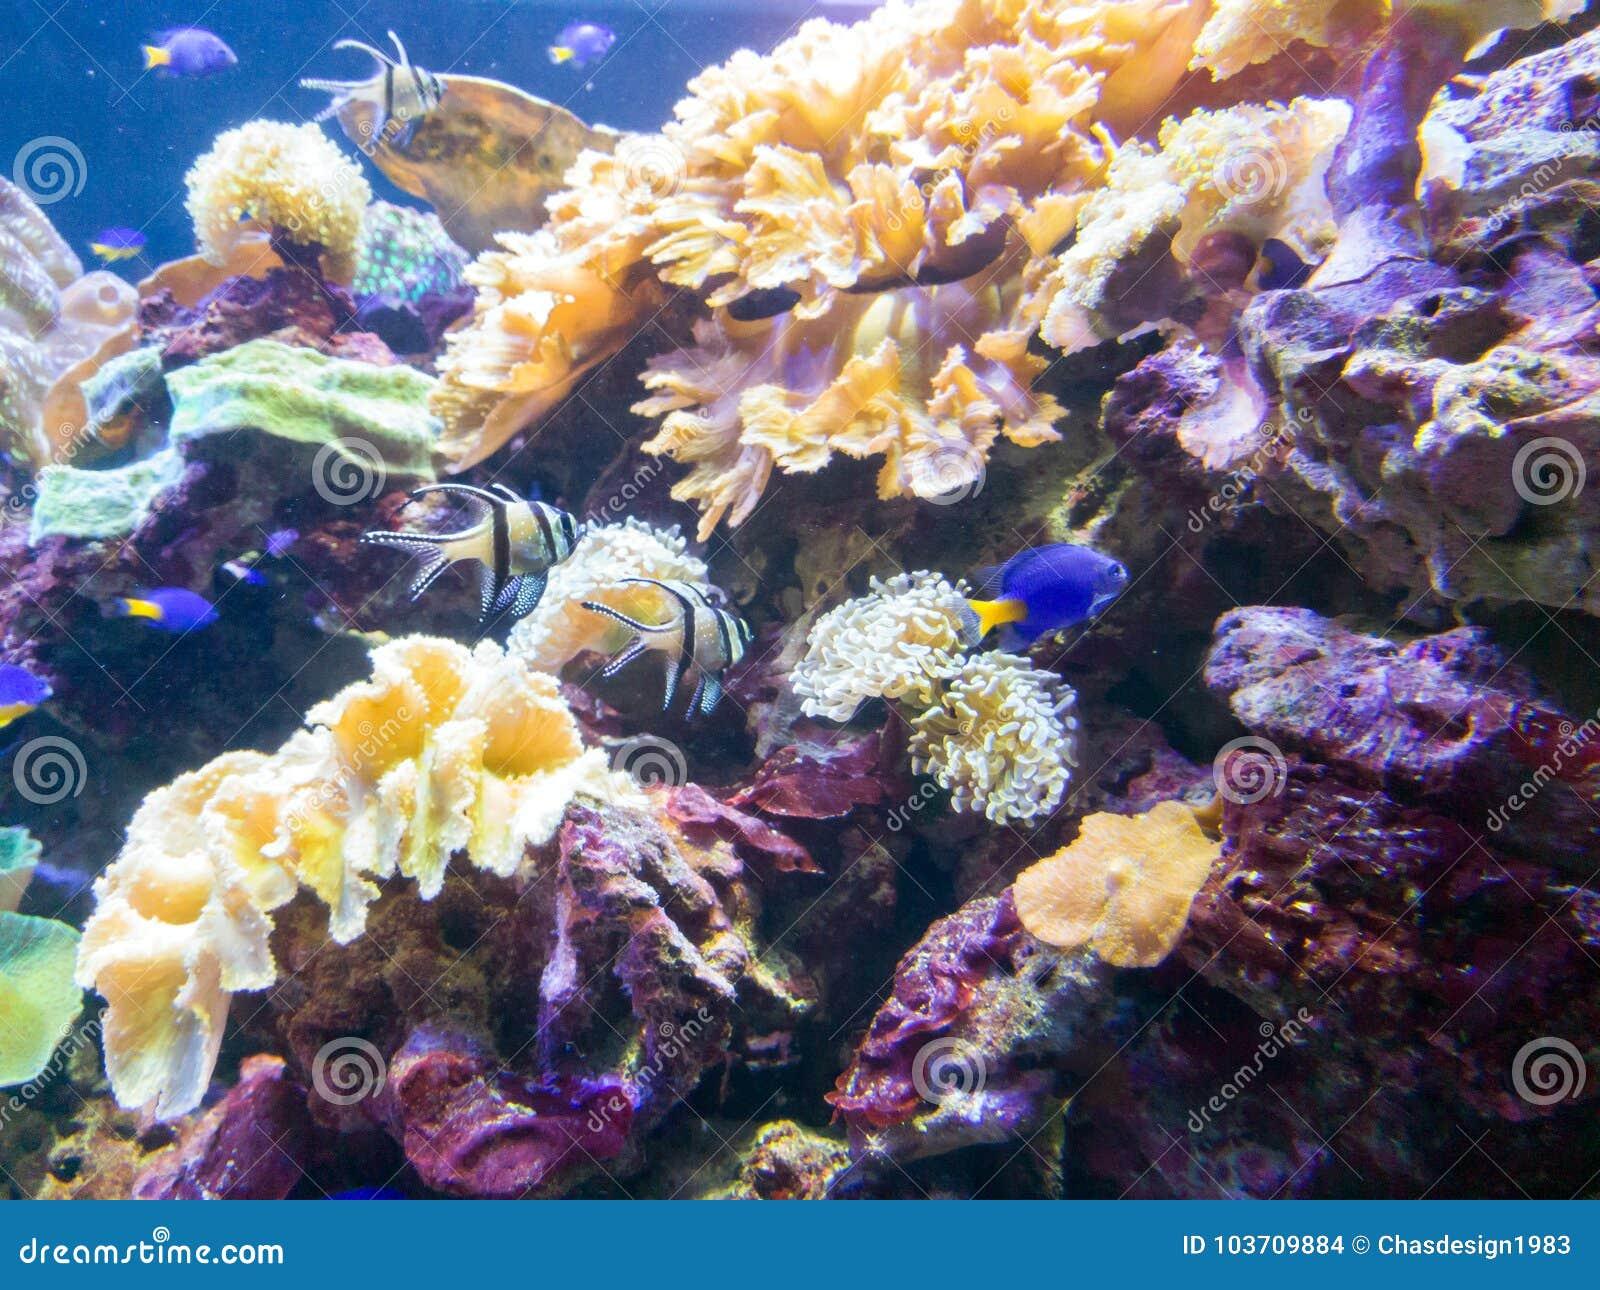 Exotic Saltwater Fish Swimming In A Big Aquarium Stock Photo - Image